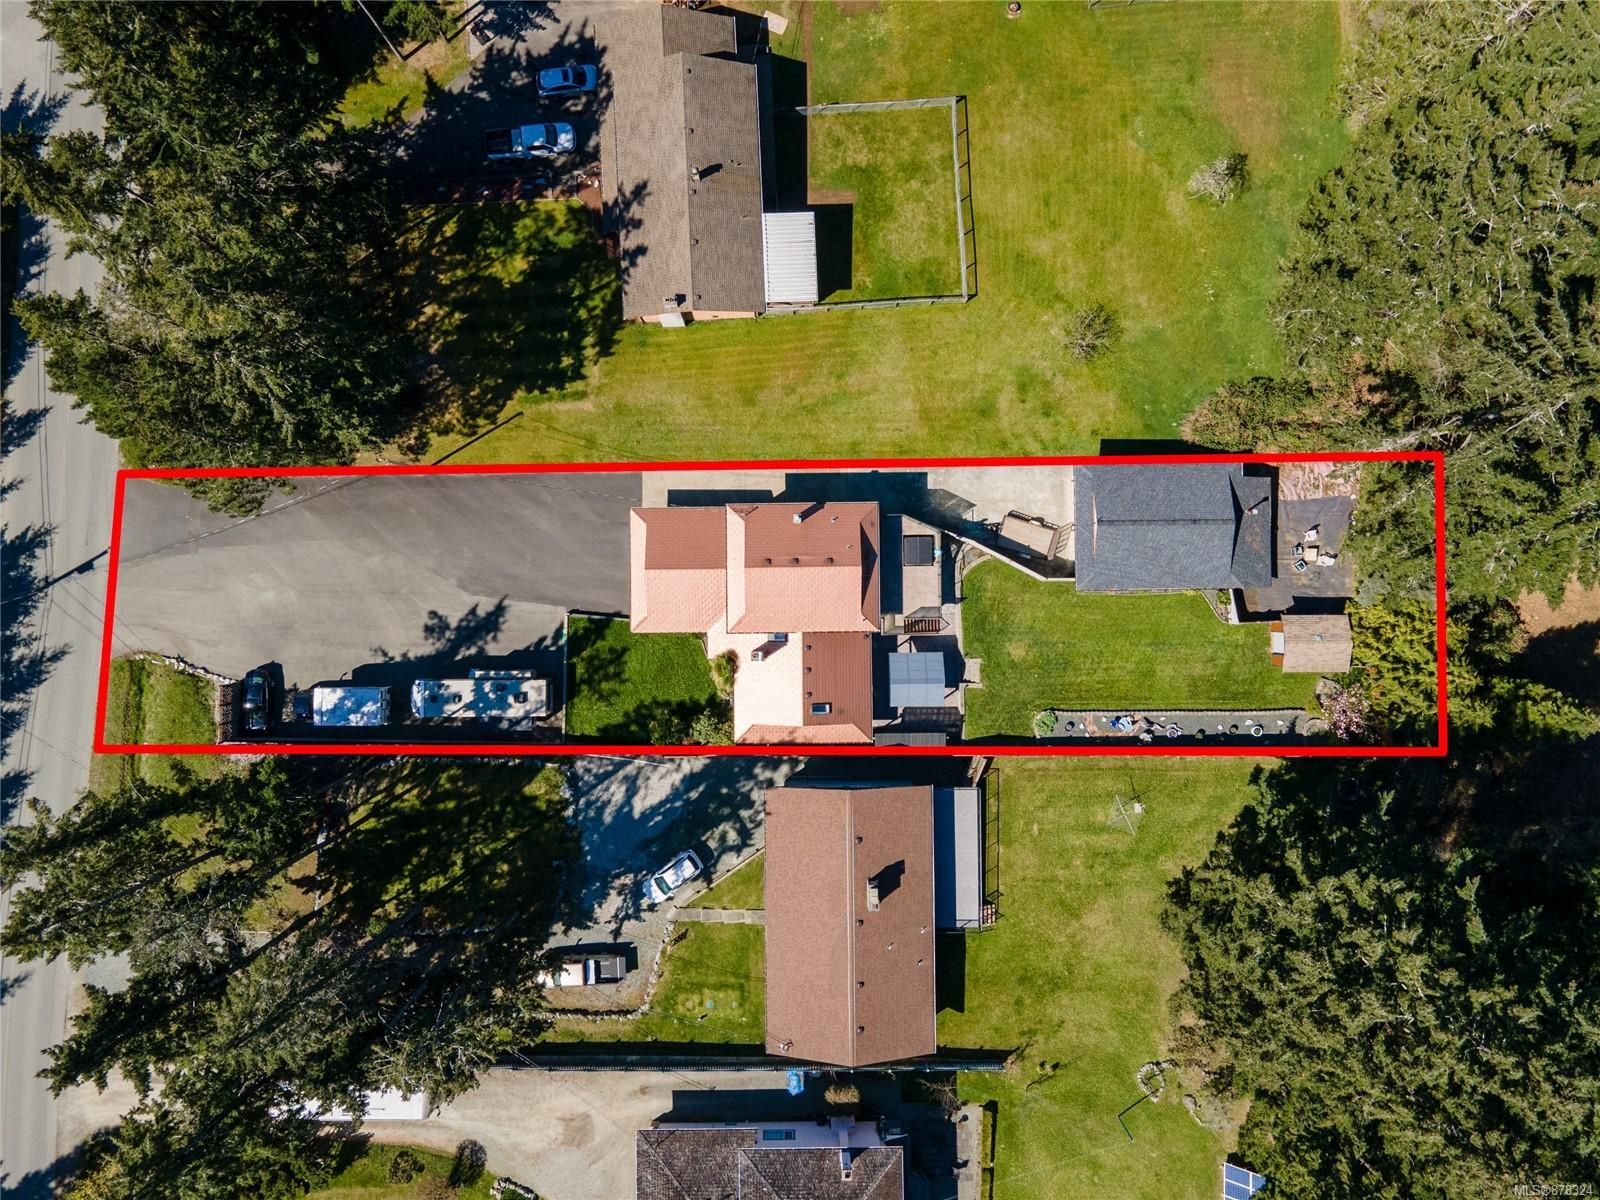 Photo 7: Photos: 3875 Moore Rd in : PA Port Alberni House for sale (Port Alberni)  : MLS®# 878324